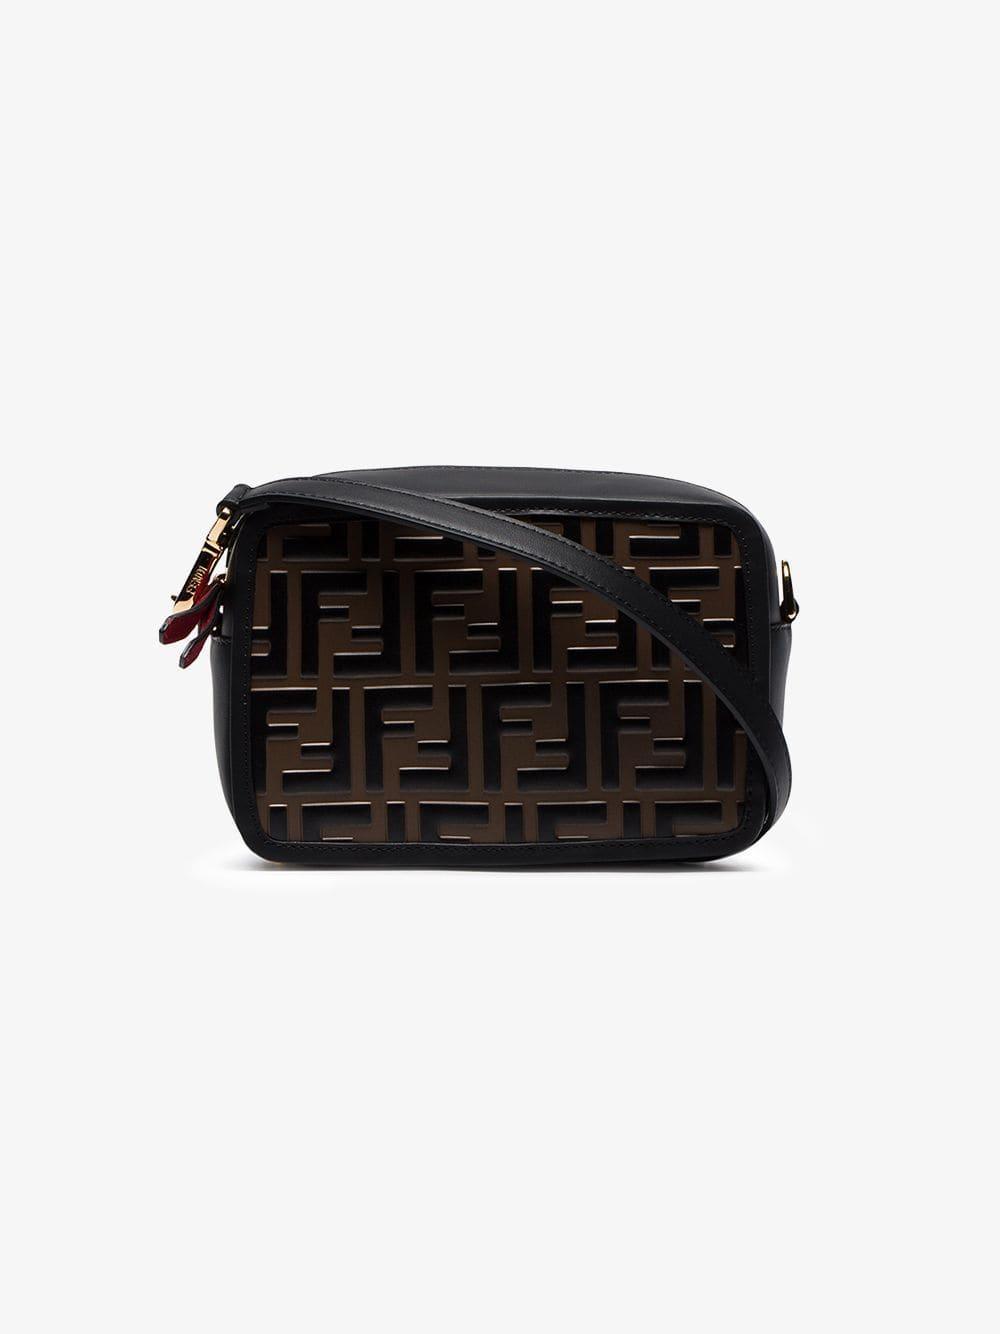 783804a83f1d Fendi Black Camera Case Leather Cross Body Bag in Black - Save 3% - Lyst